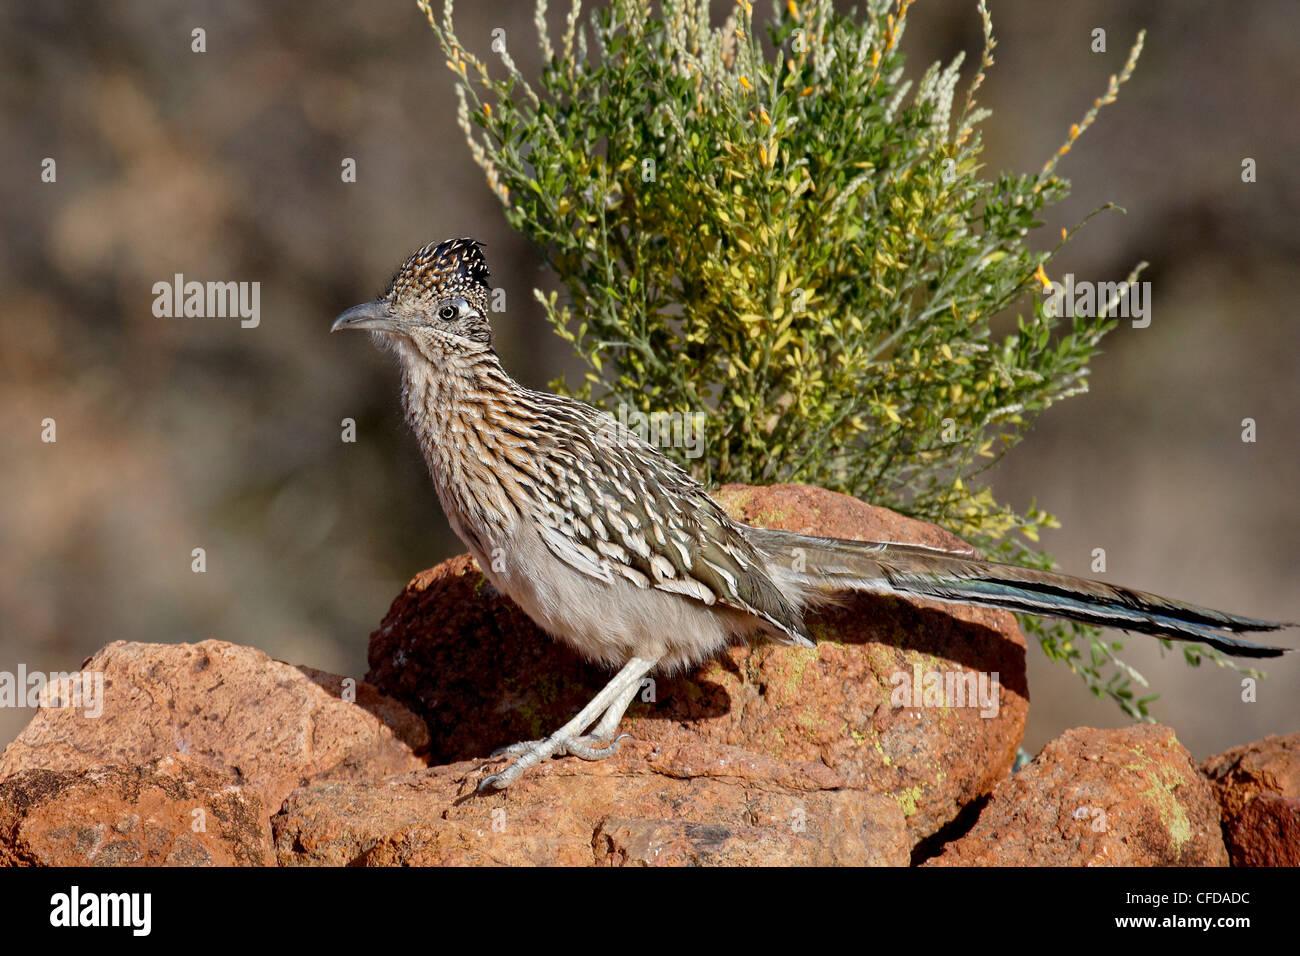 Greater roadrunner (Geococcyx californianus), The Pond, Amado, Arizona, United States of America, - Stock Image